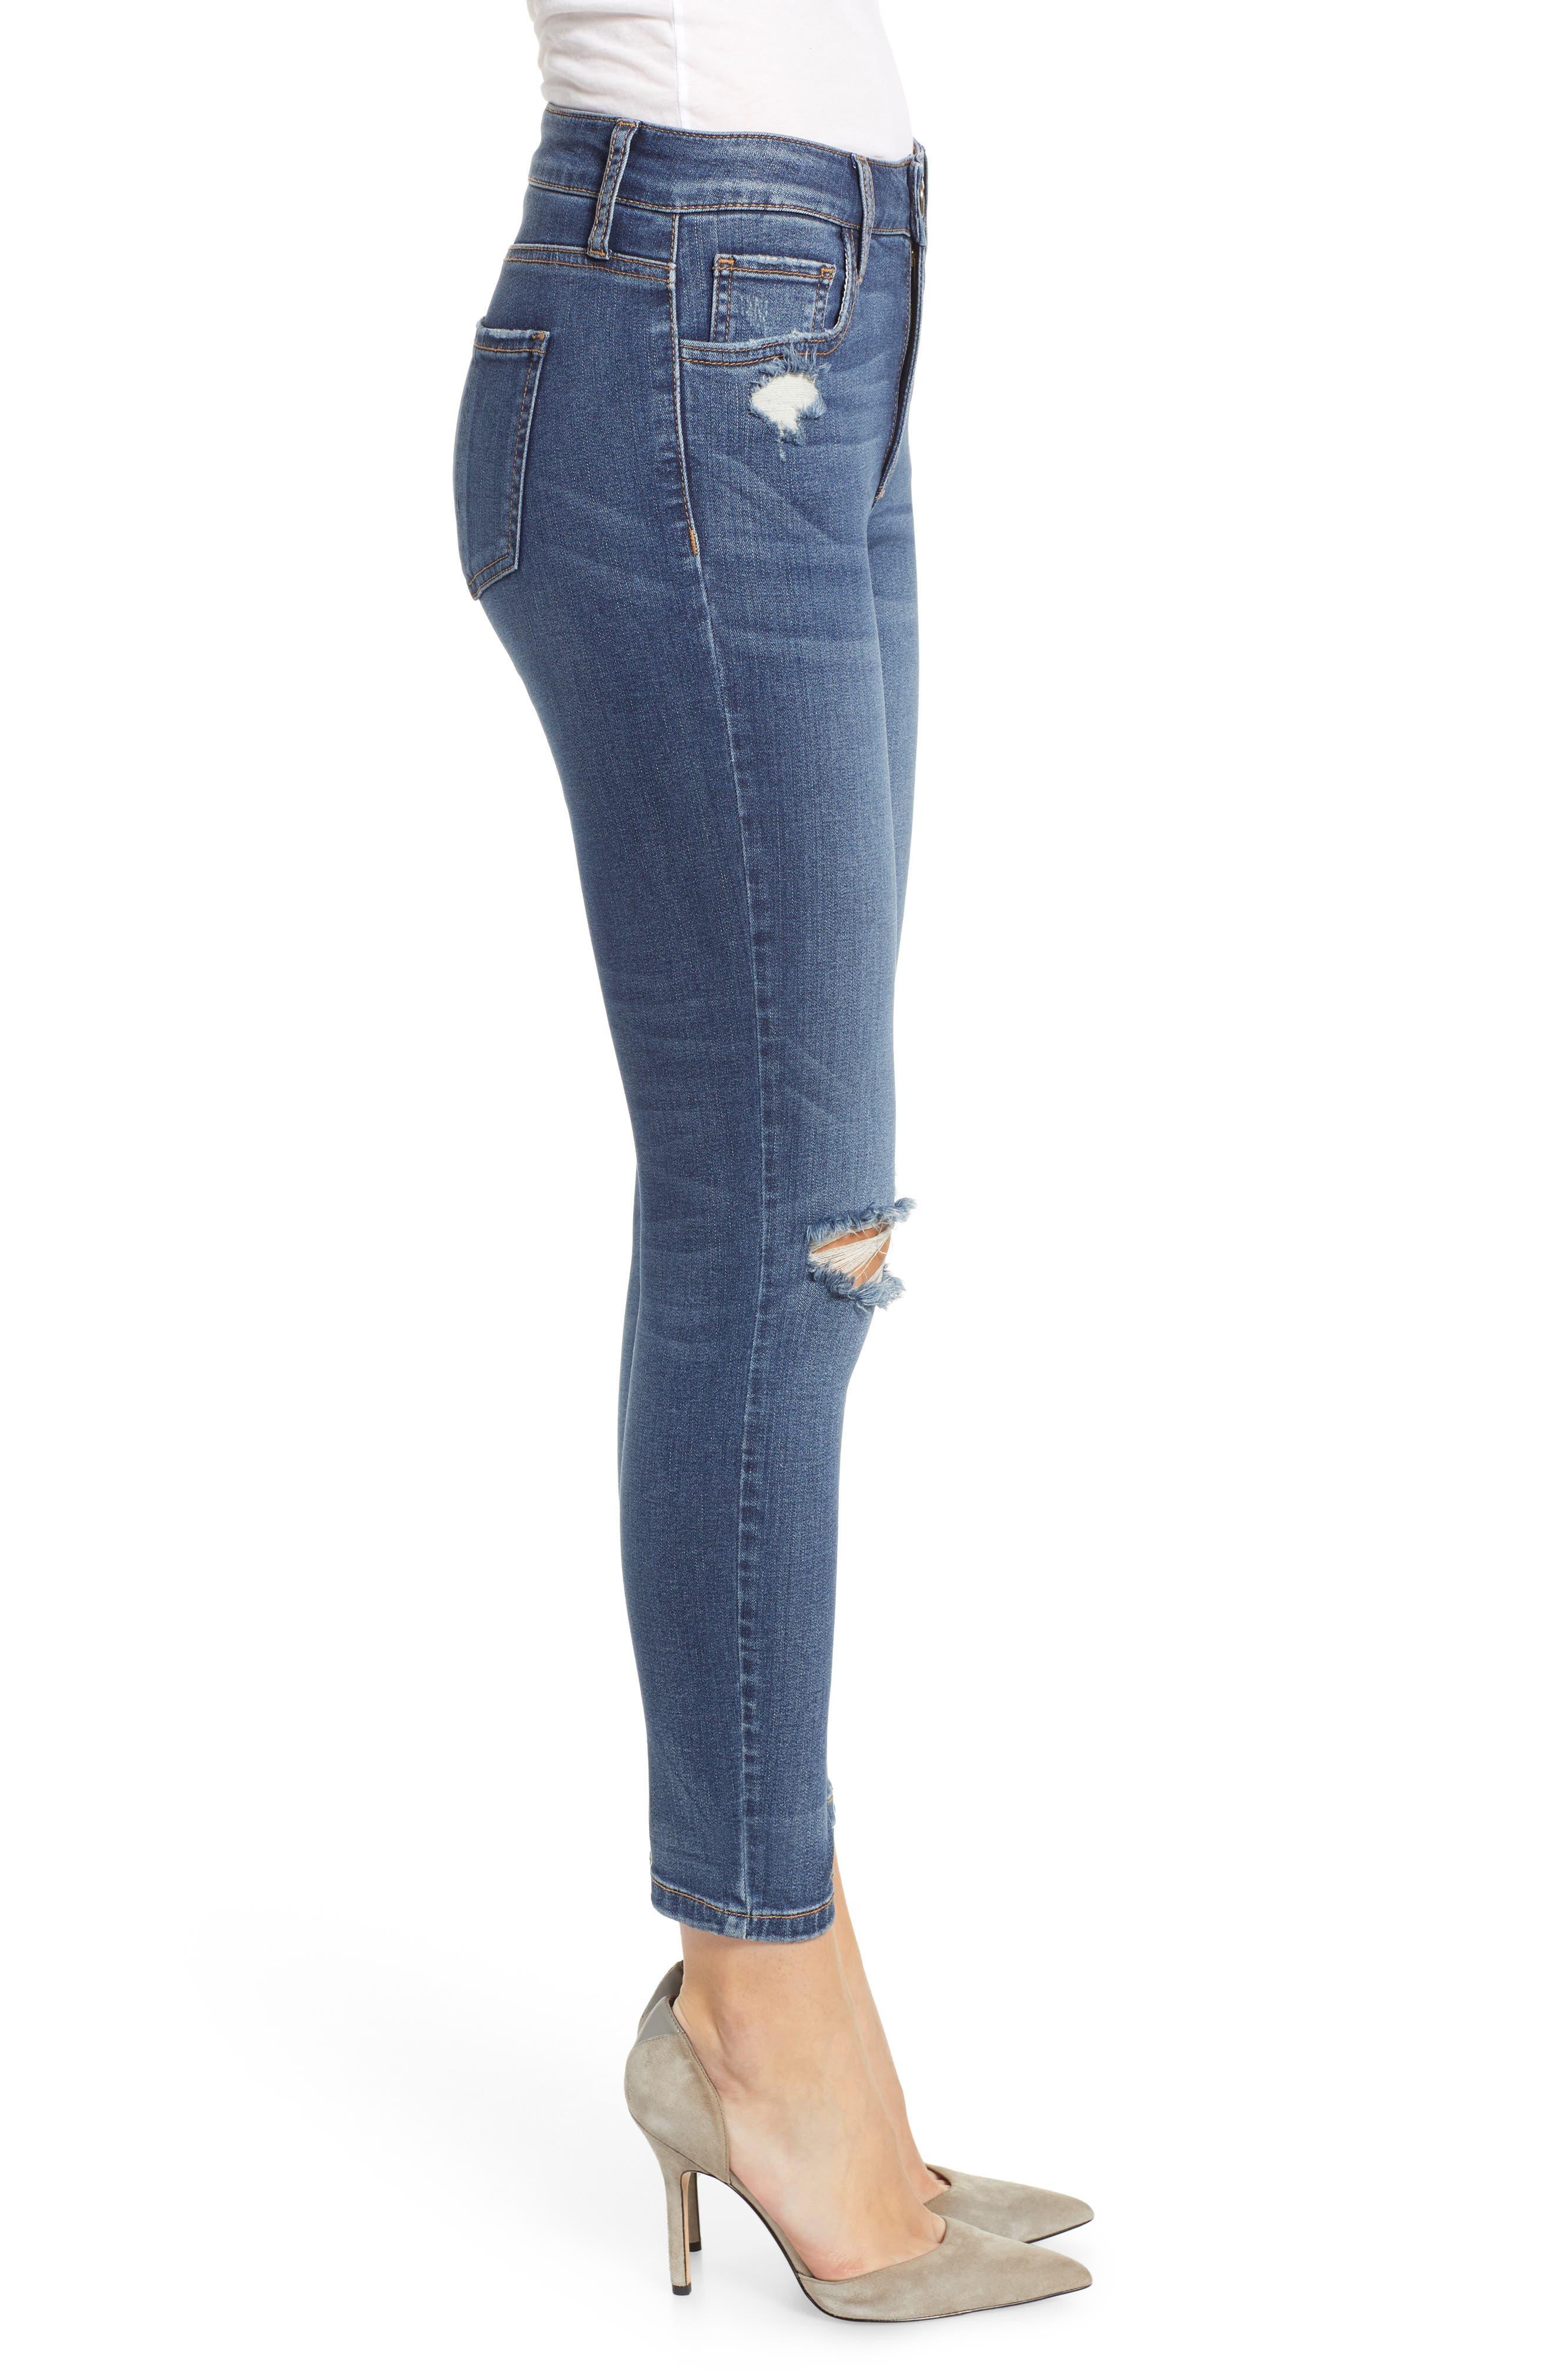 PROSPERITY DENIM,                             Ripped High Waist Skinny Jeans,                             Alternate thumbnail 3, color,                             RAYA WASH